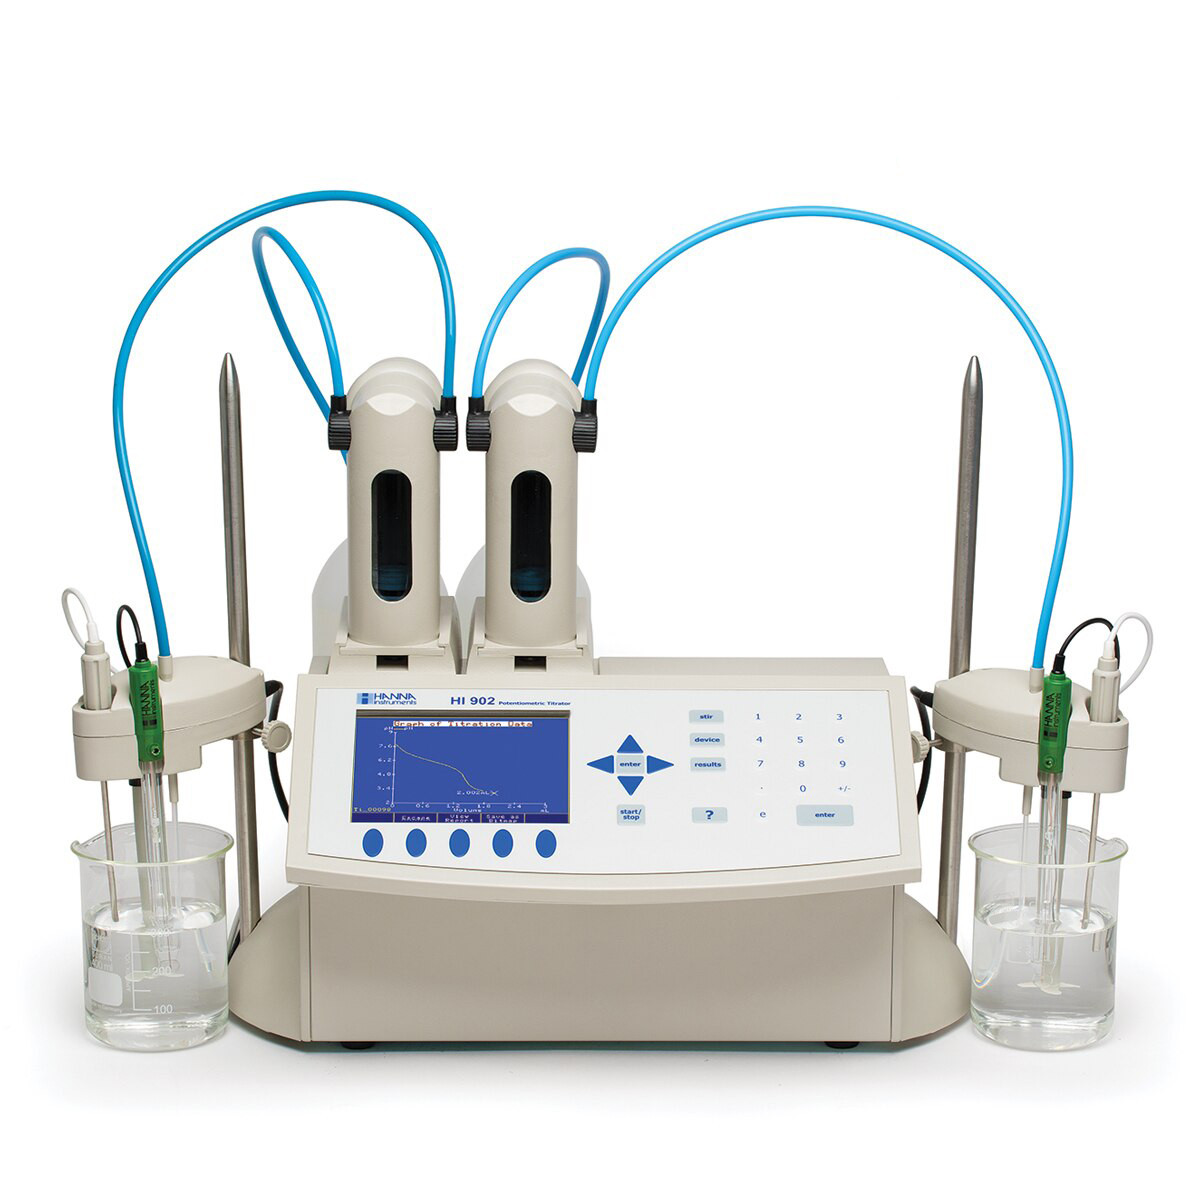 Automatic Potentiometric (pH/mV/ISE) Titration System